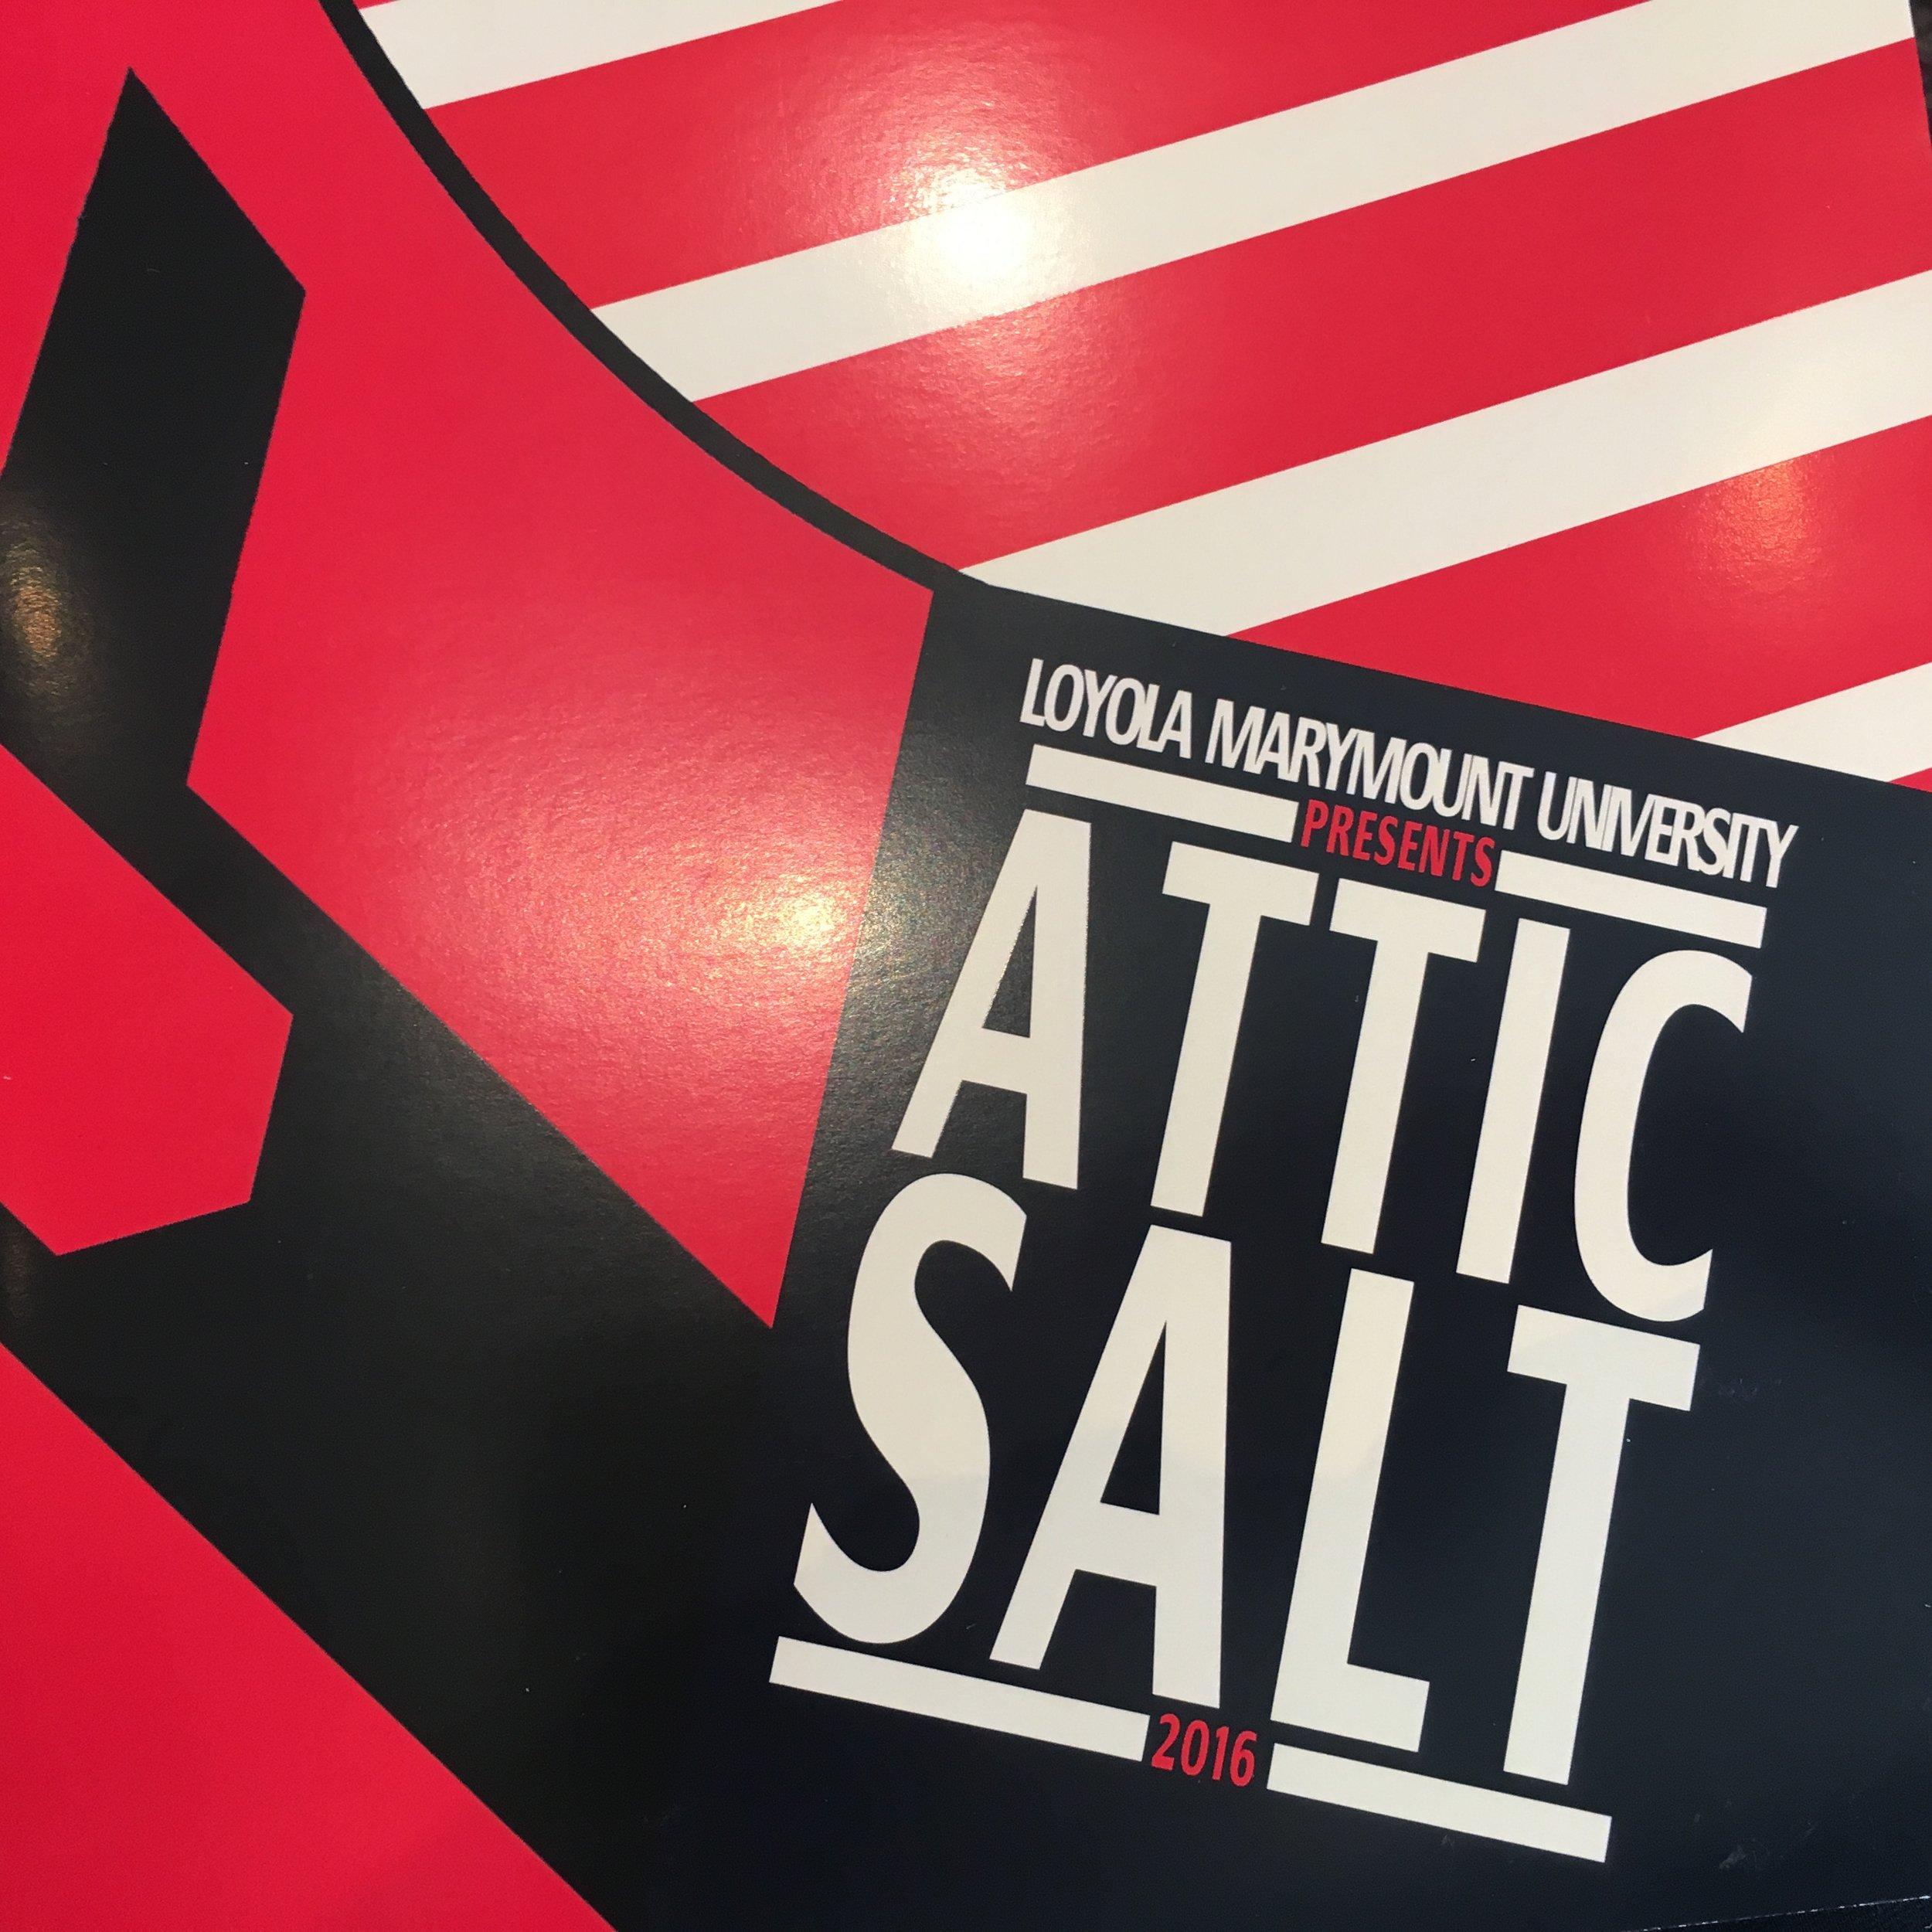 Attic Salt: Loyola Marymount University's Interdisciplinary Honors Journal